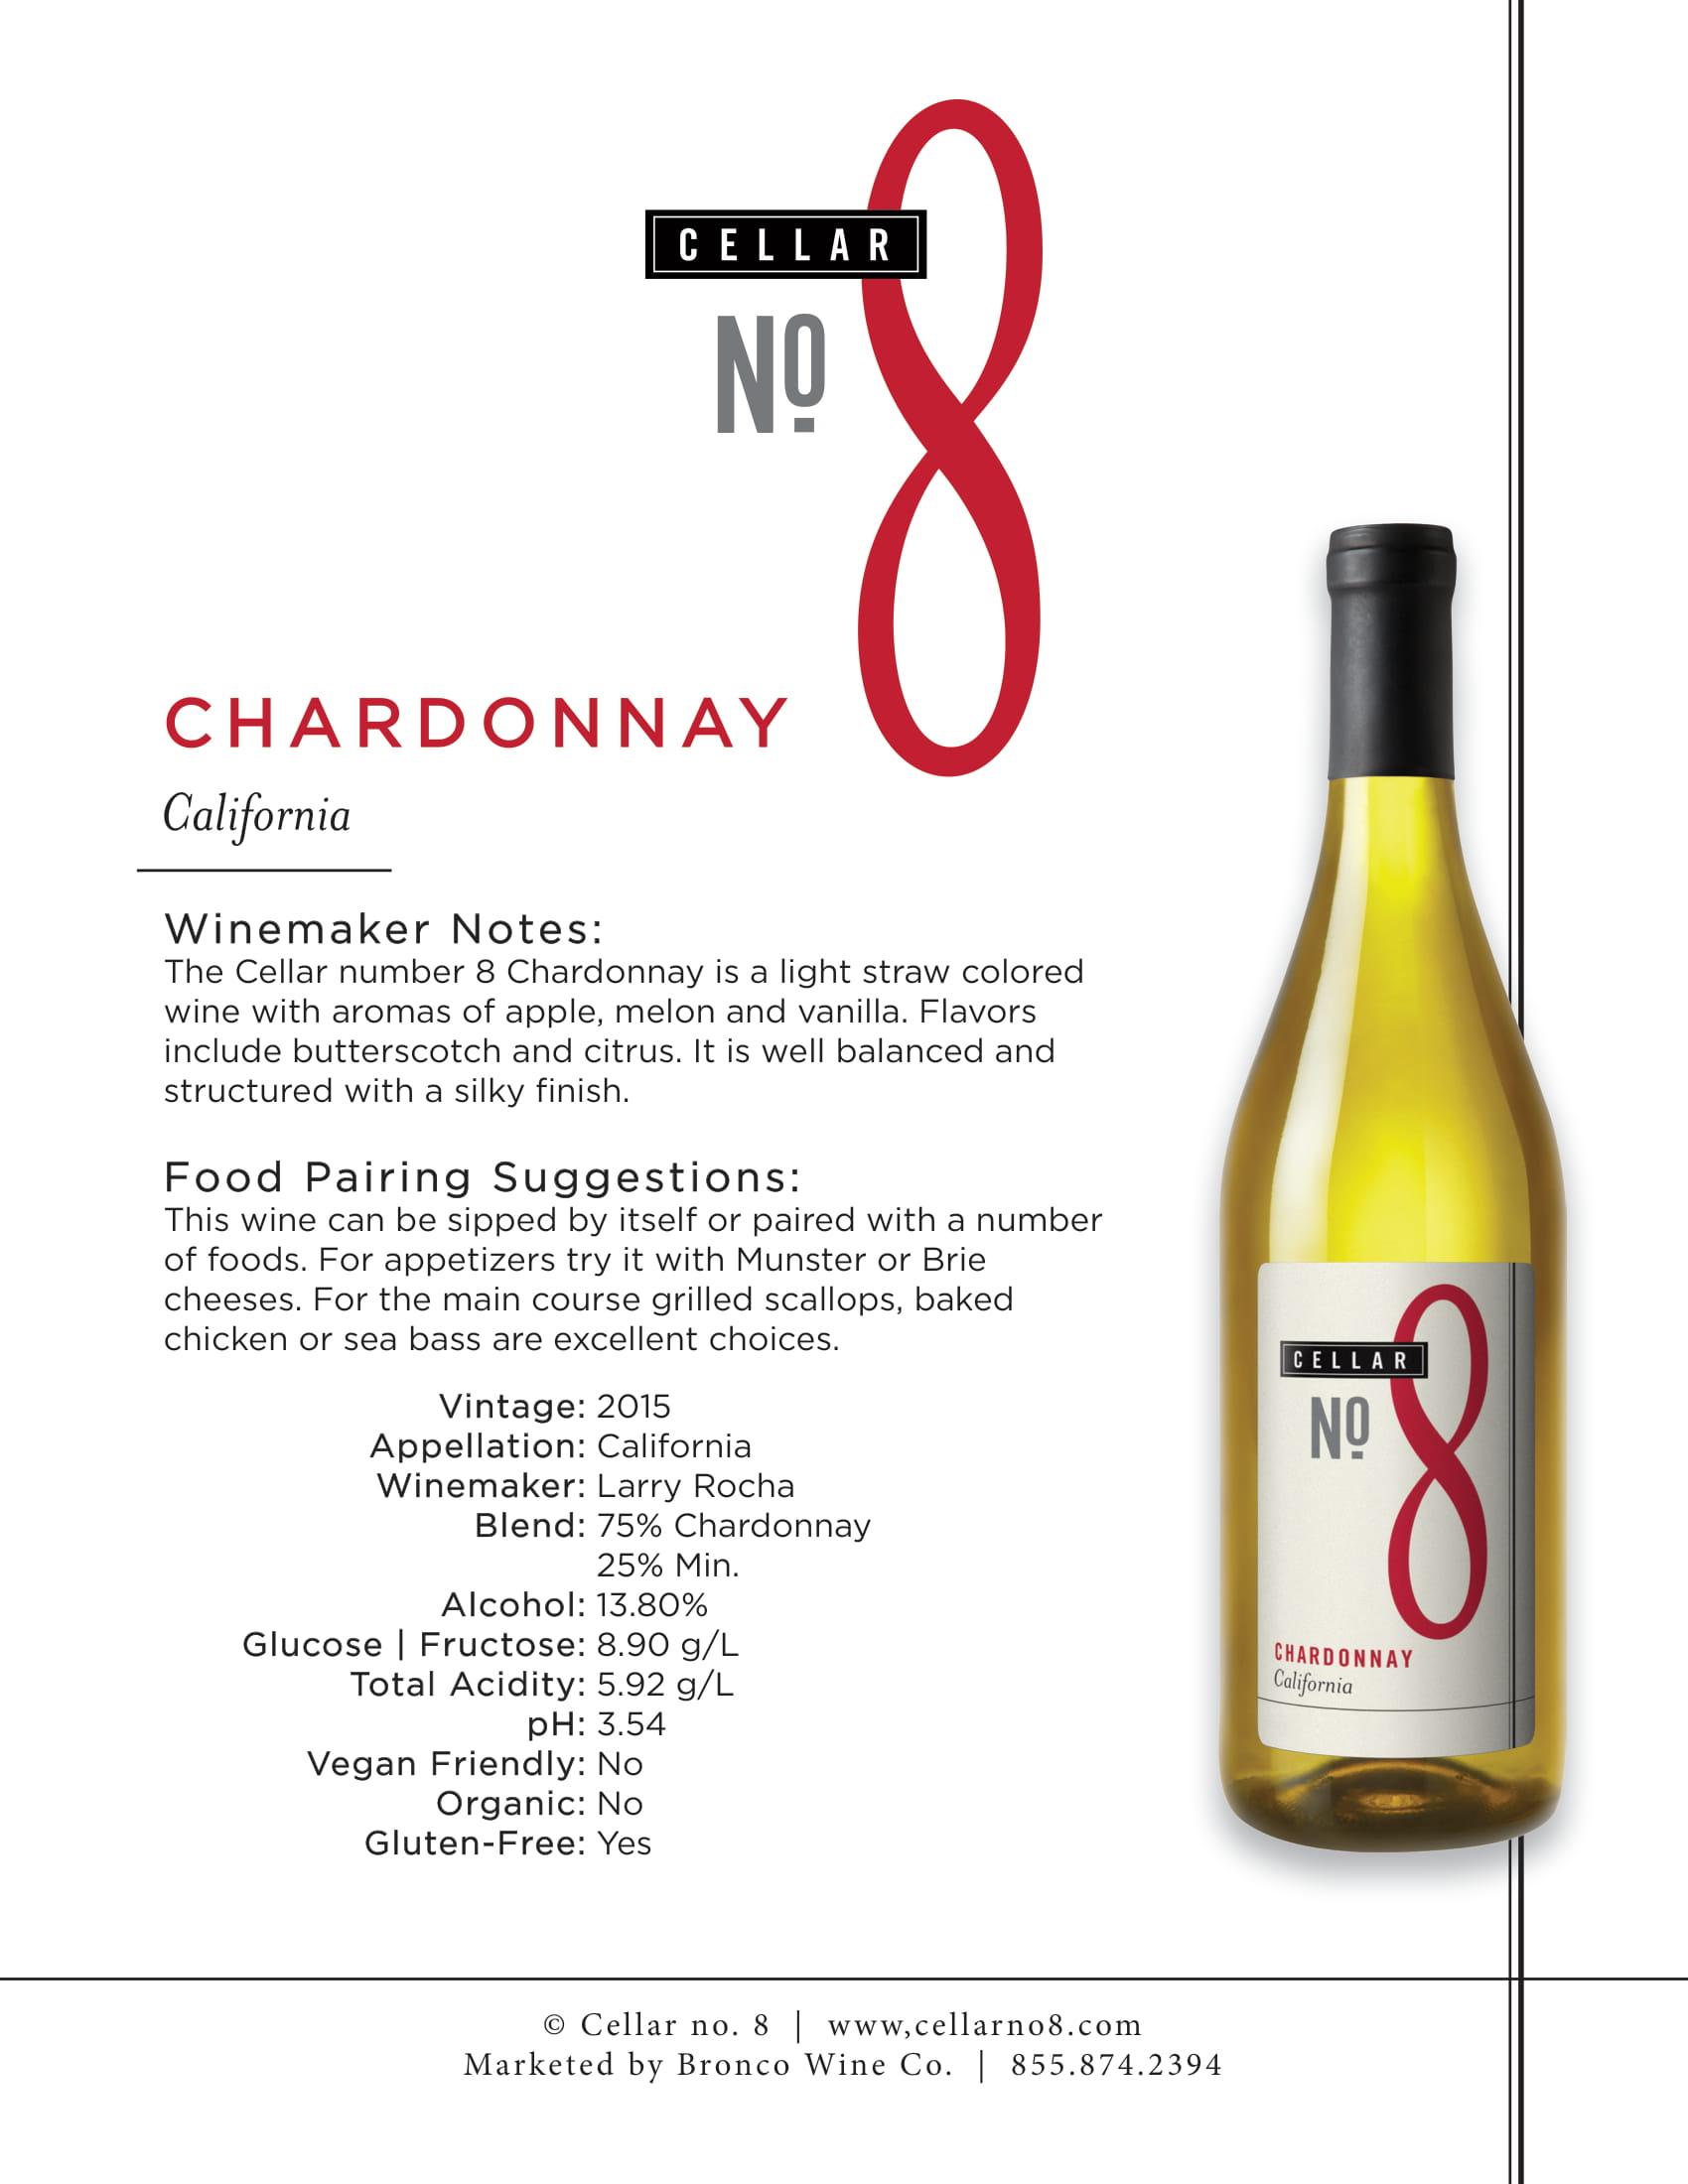 Cellar #8 Chardonnay Tech Sheet